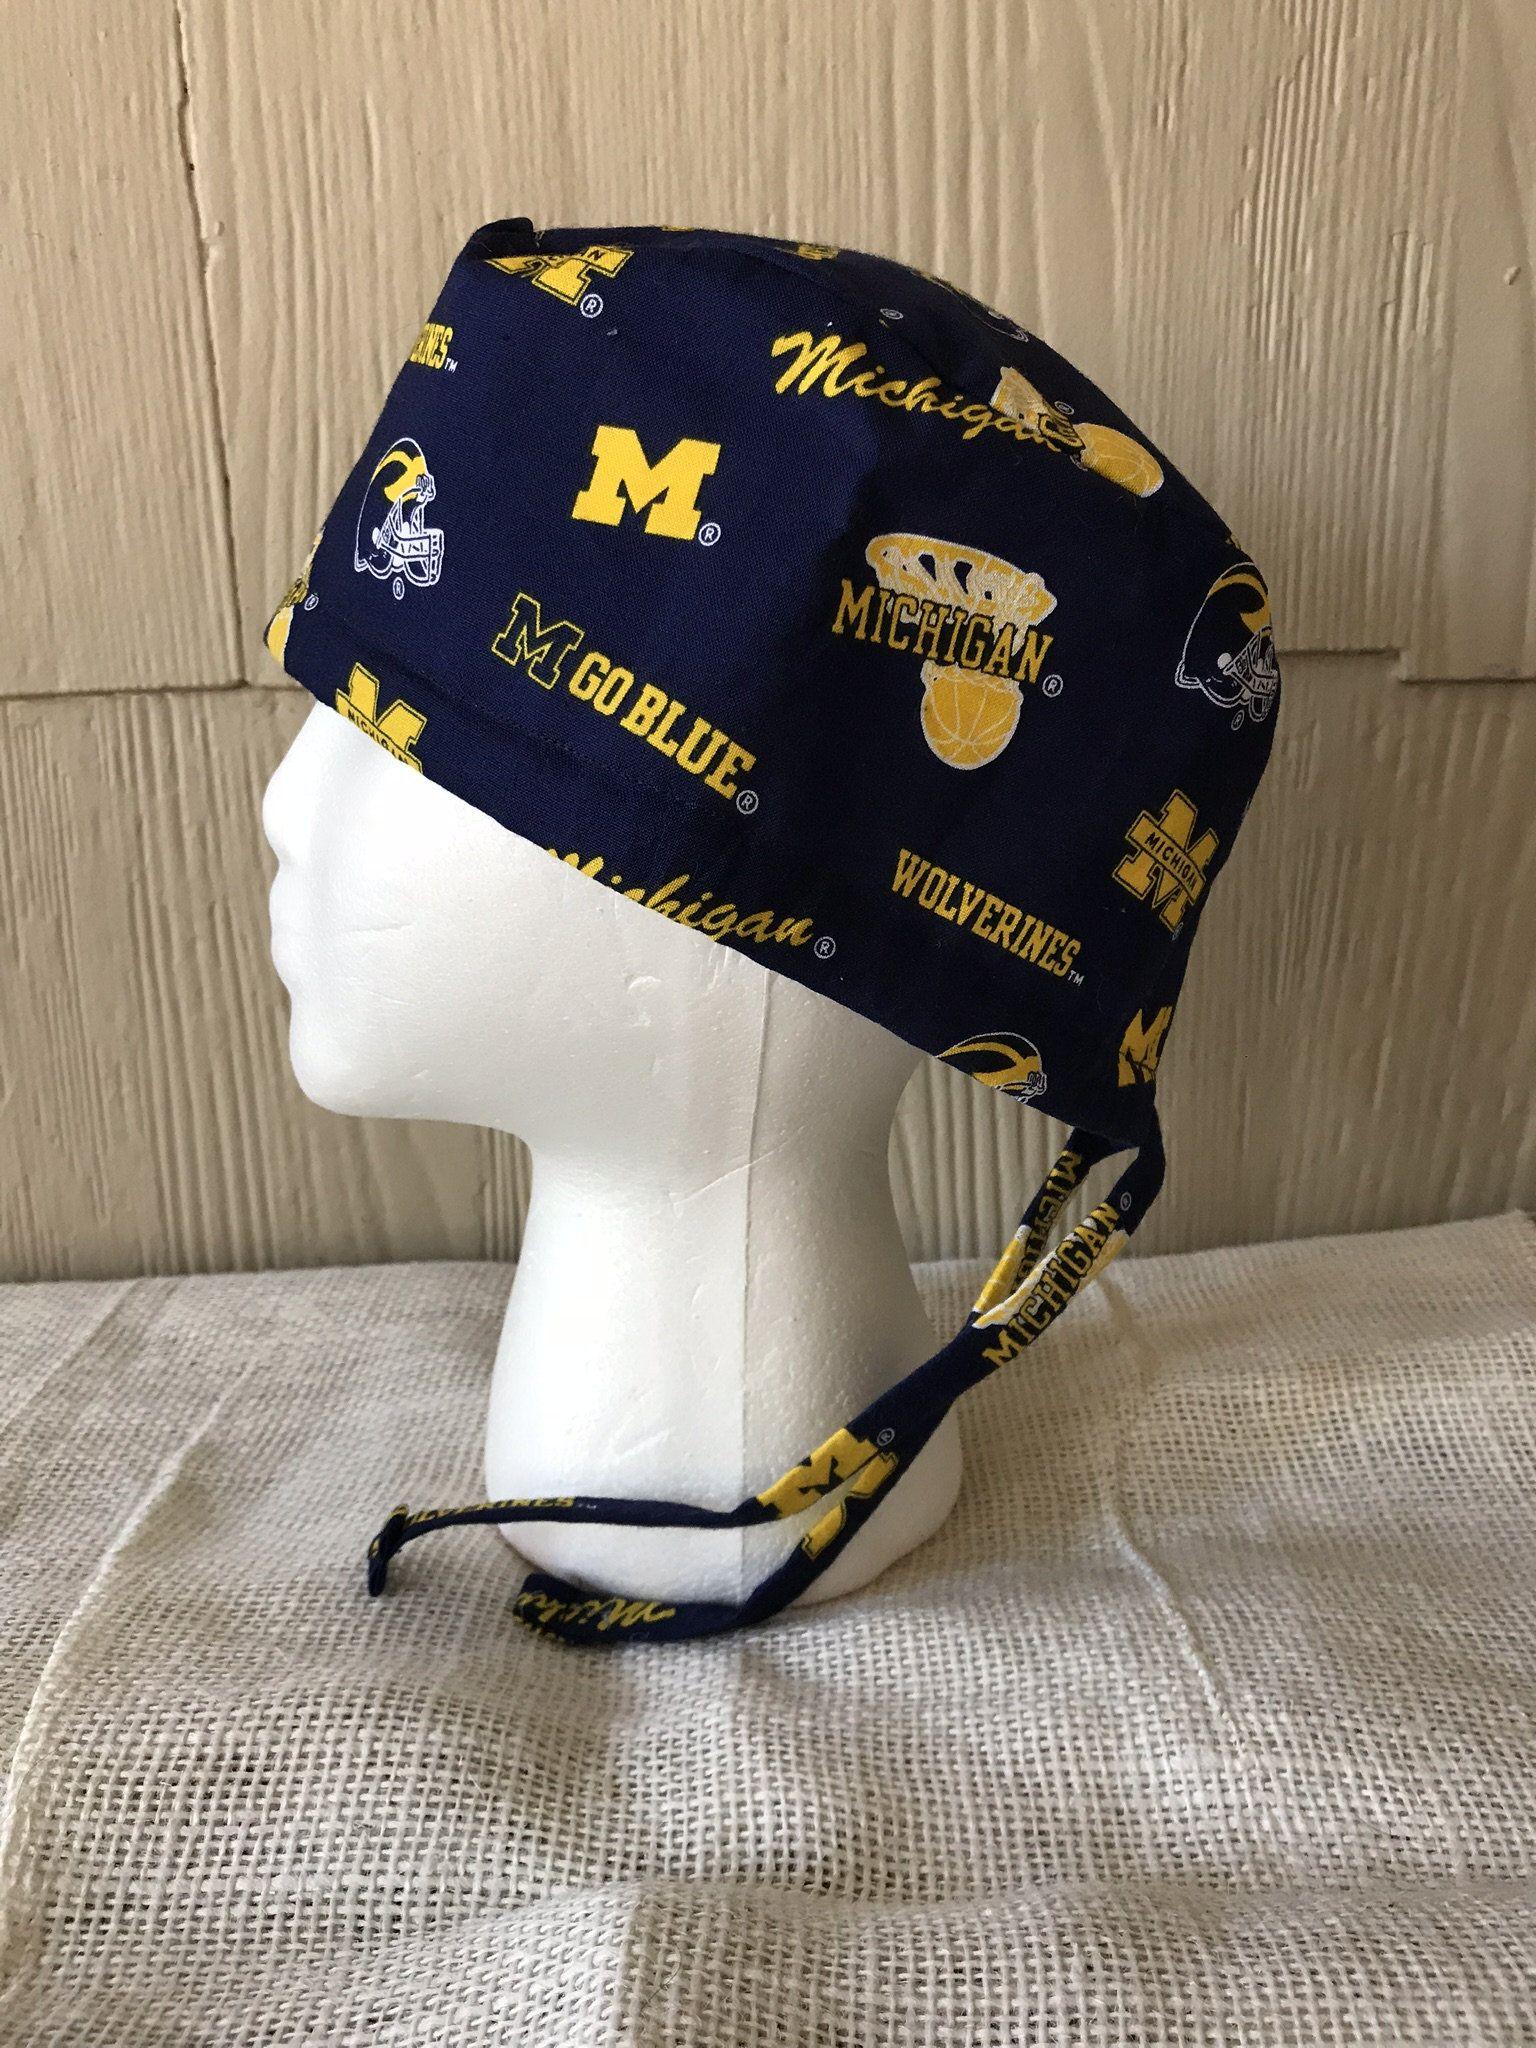 95b26e8fe57 ... new arrivals university of michigan scrub cap logos on blue surgery cap  scrub hat scrub caps